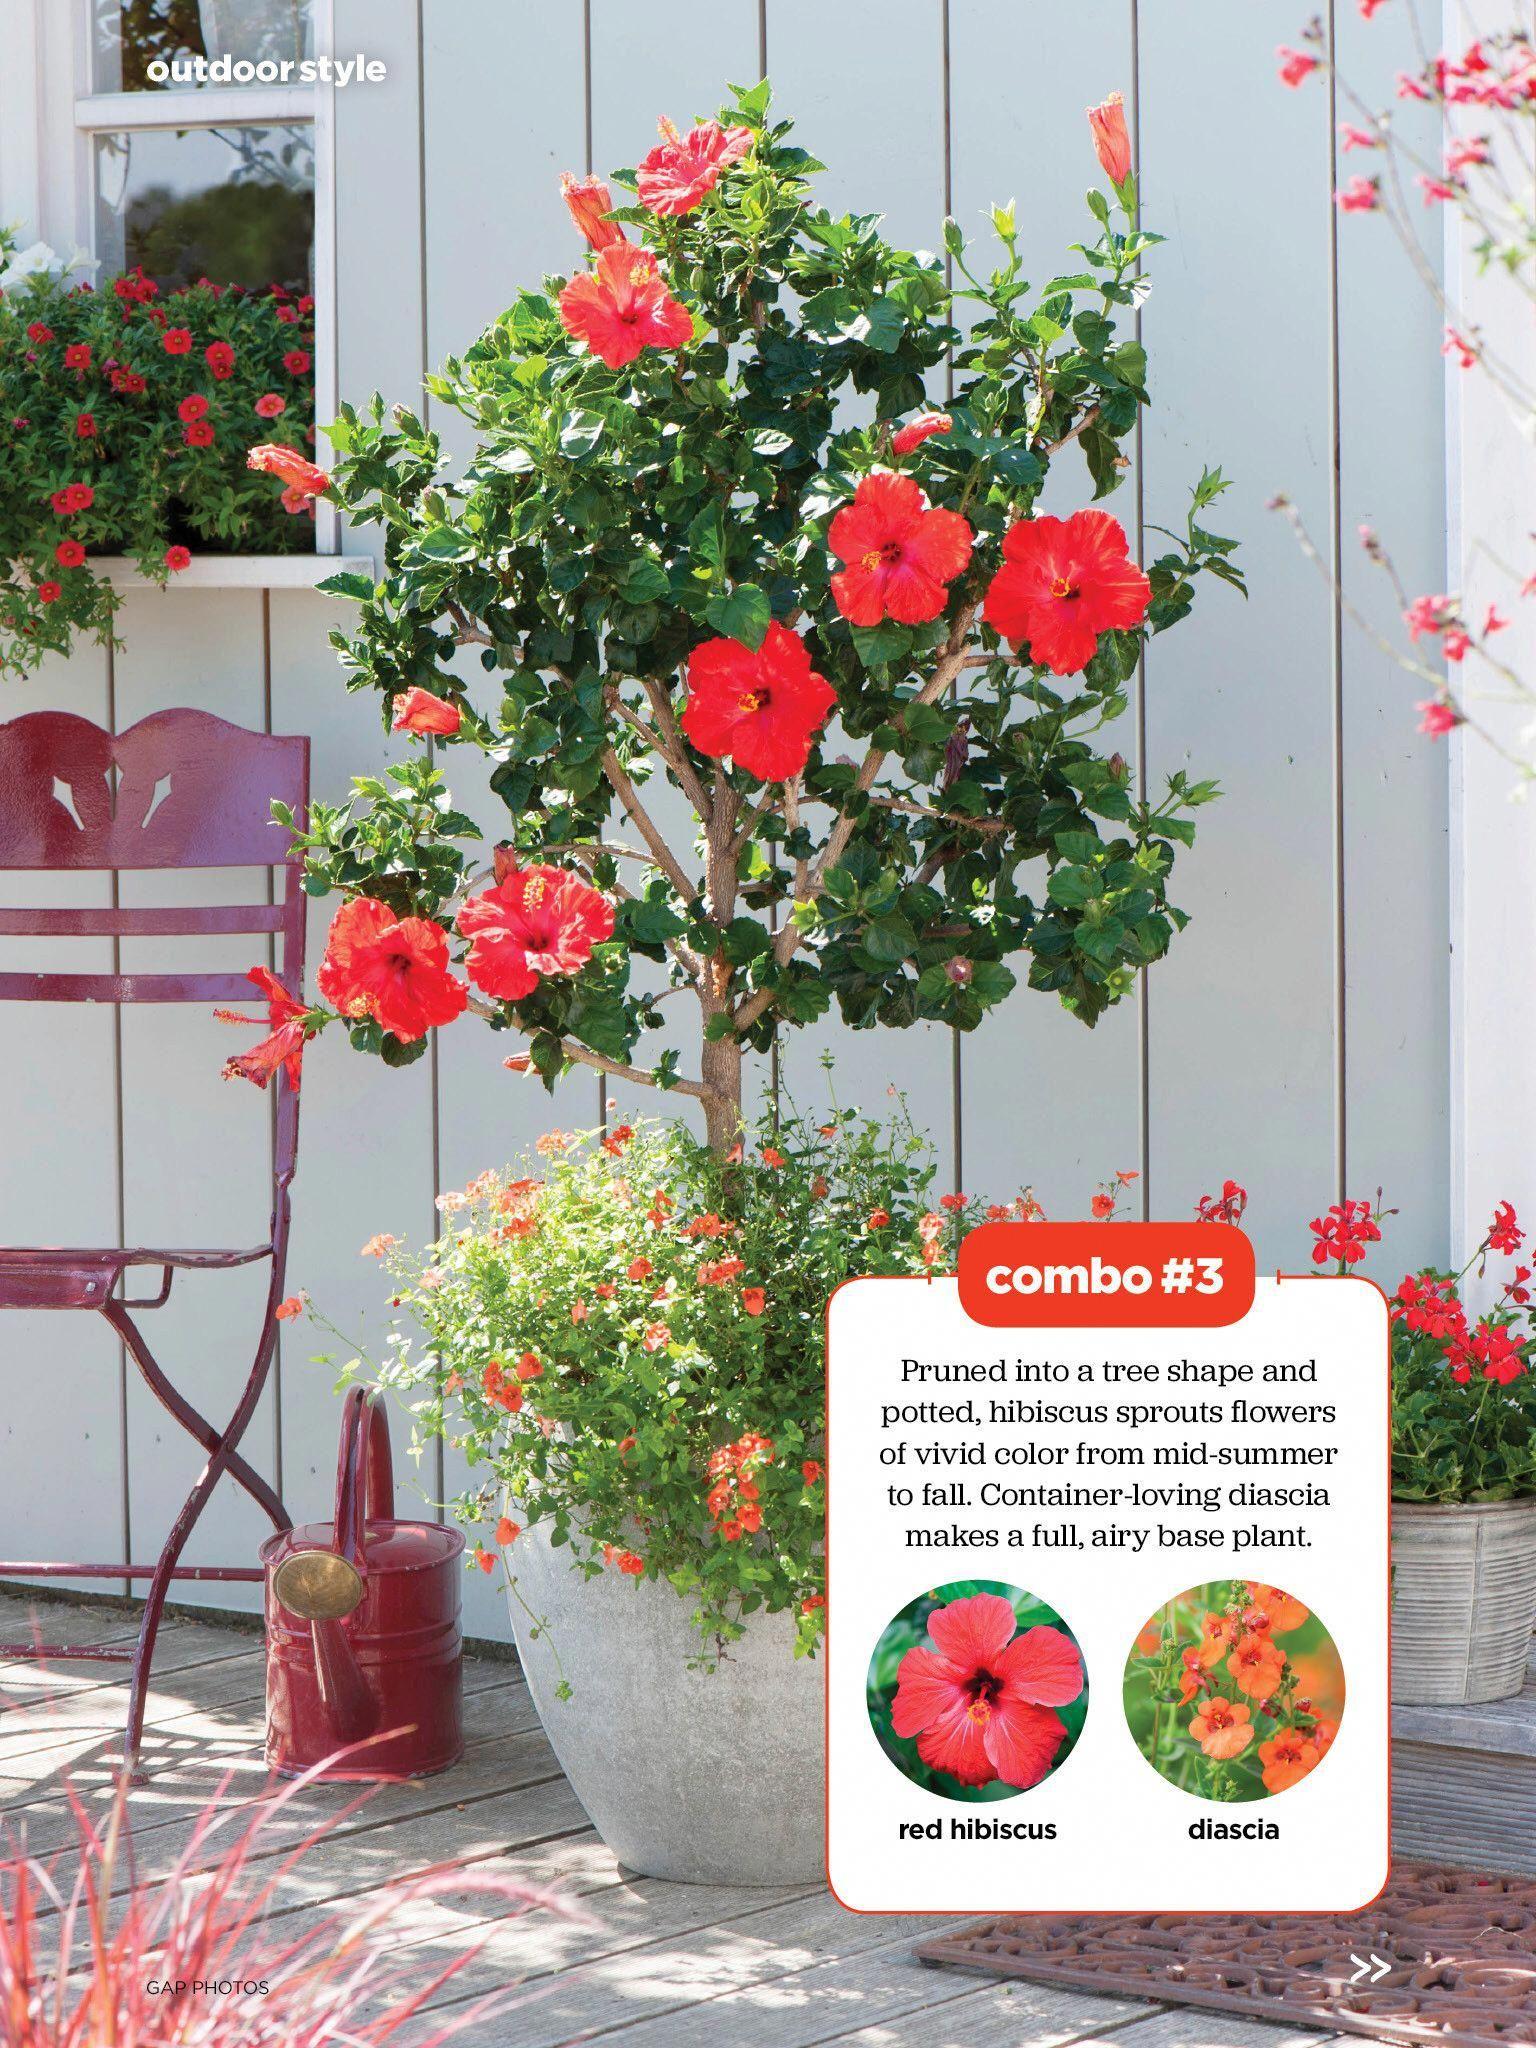 Hibiscus Flower Benefits In Hindi Hibiscus In 2020 Hibiscus Plant Hibiscus Tree Growing Hibiscus